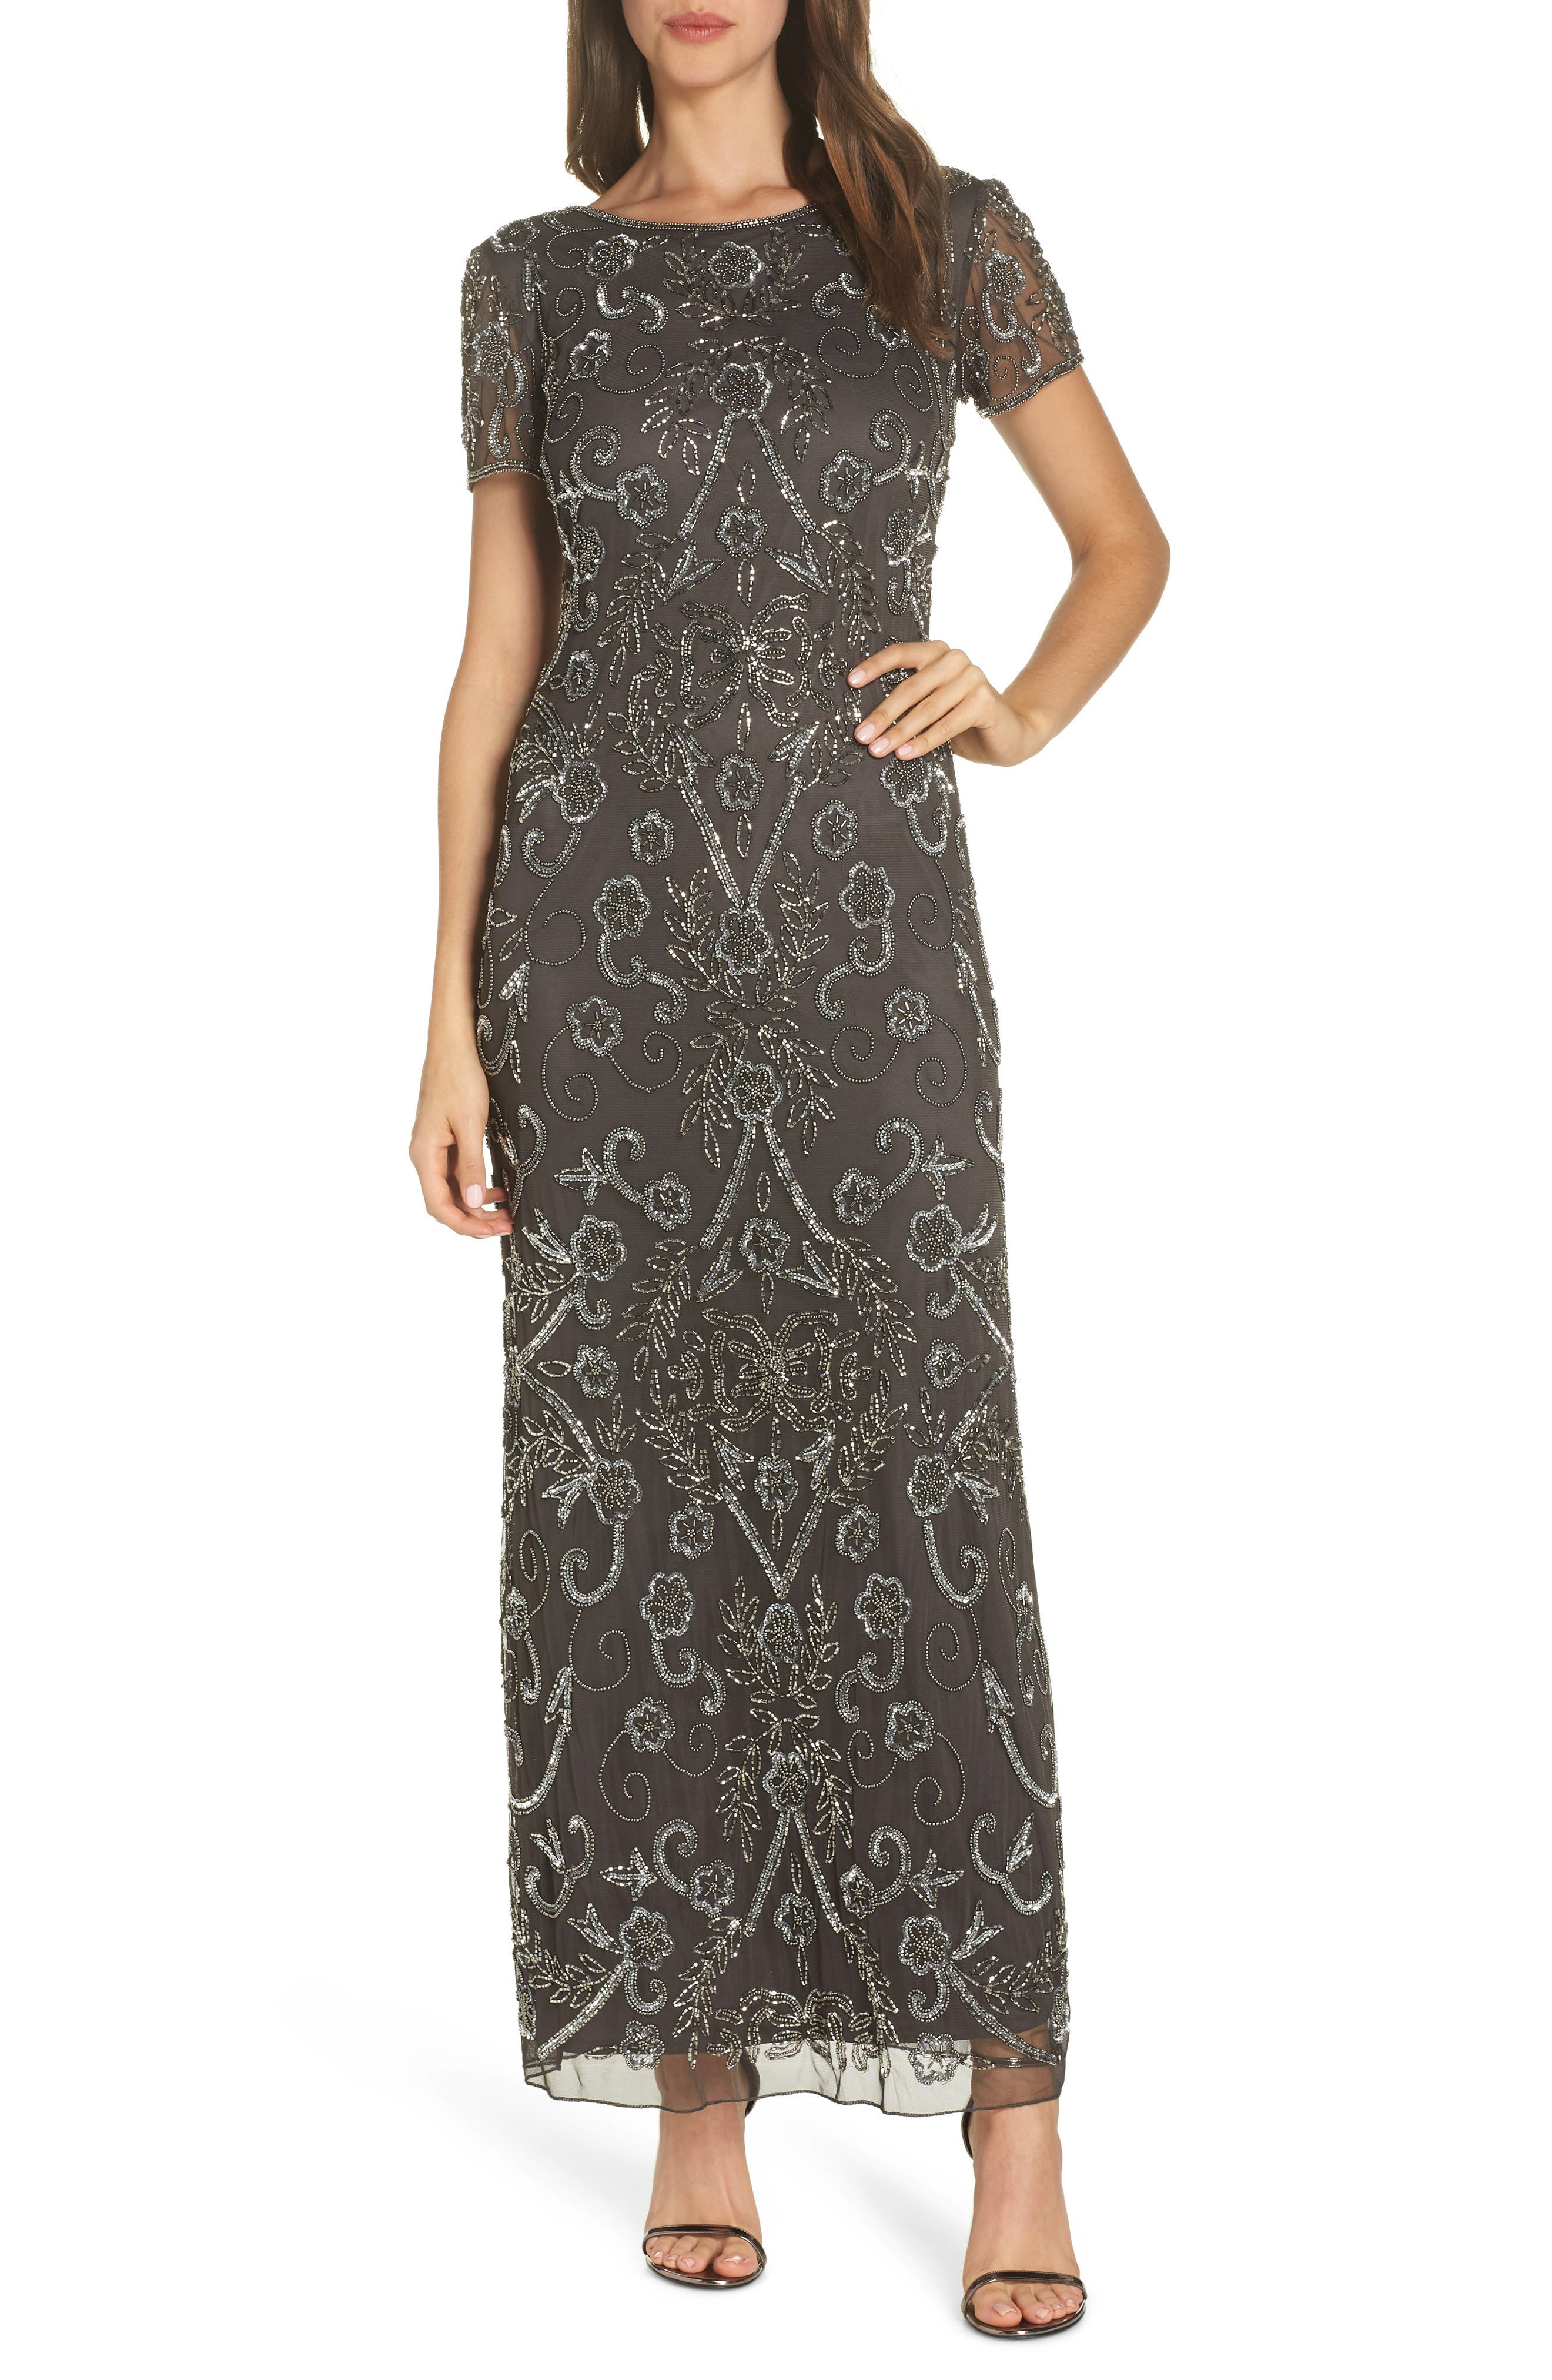 Pisarro Nights Embellished Mesh Evening Dress, Metallic